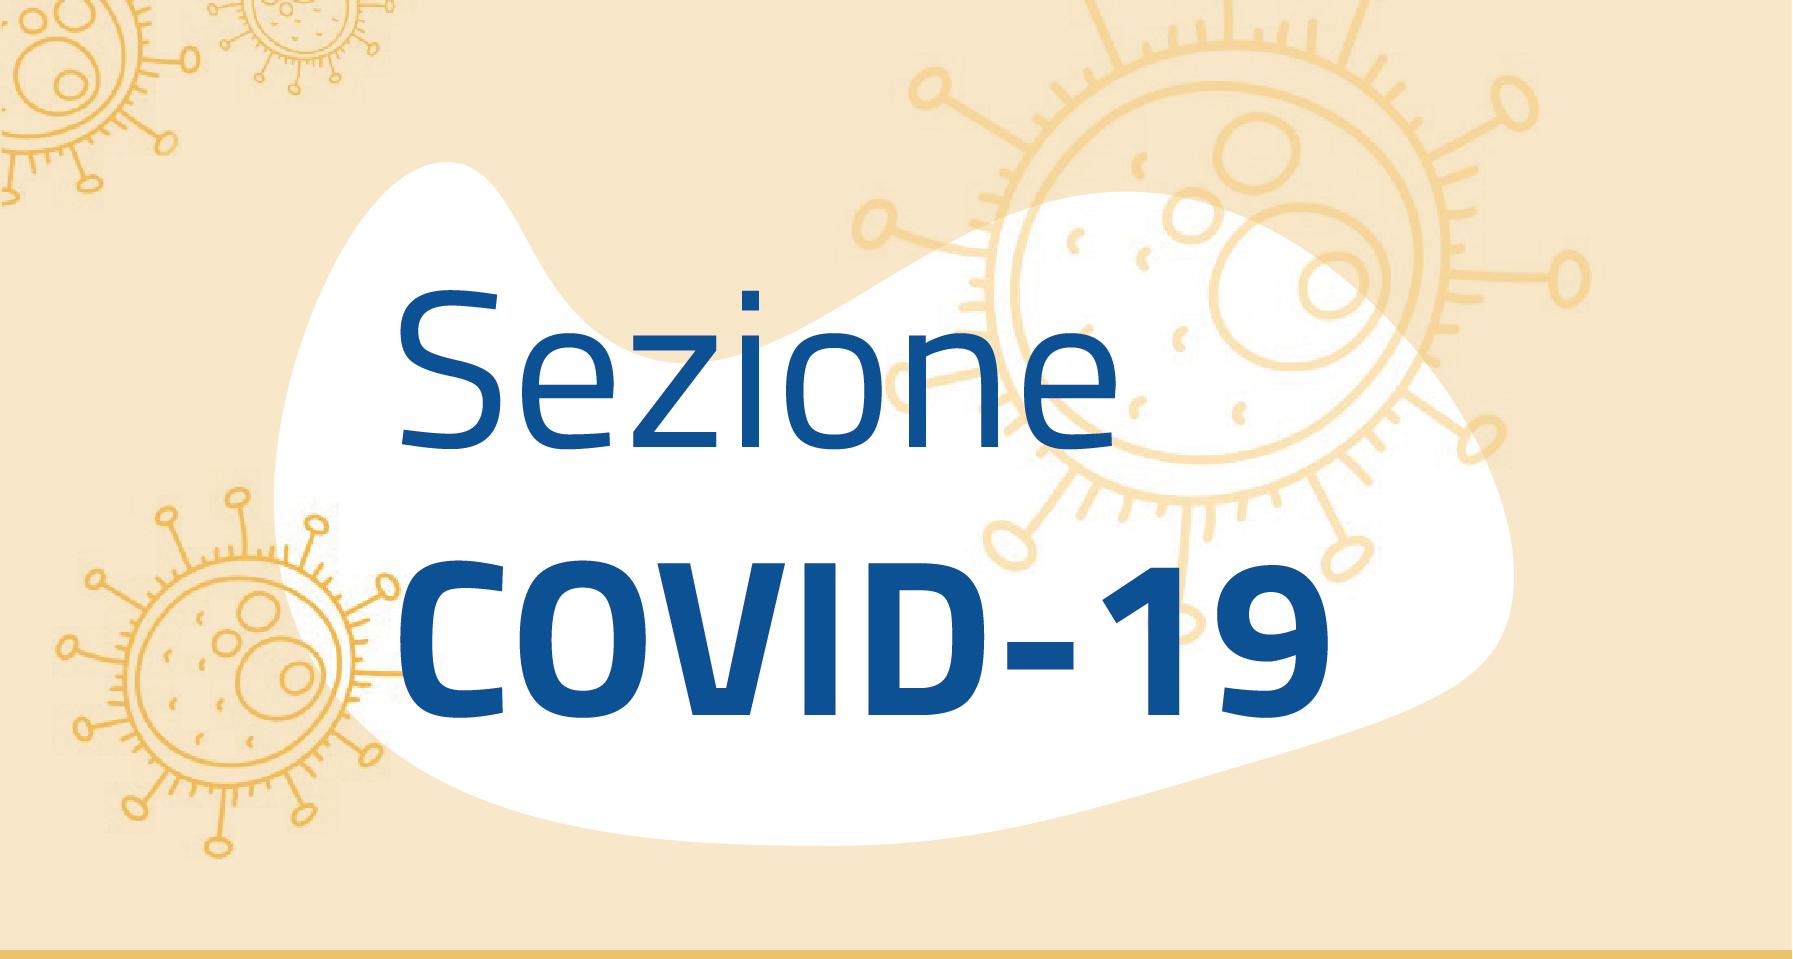 SezCOVID19